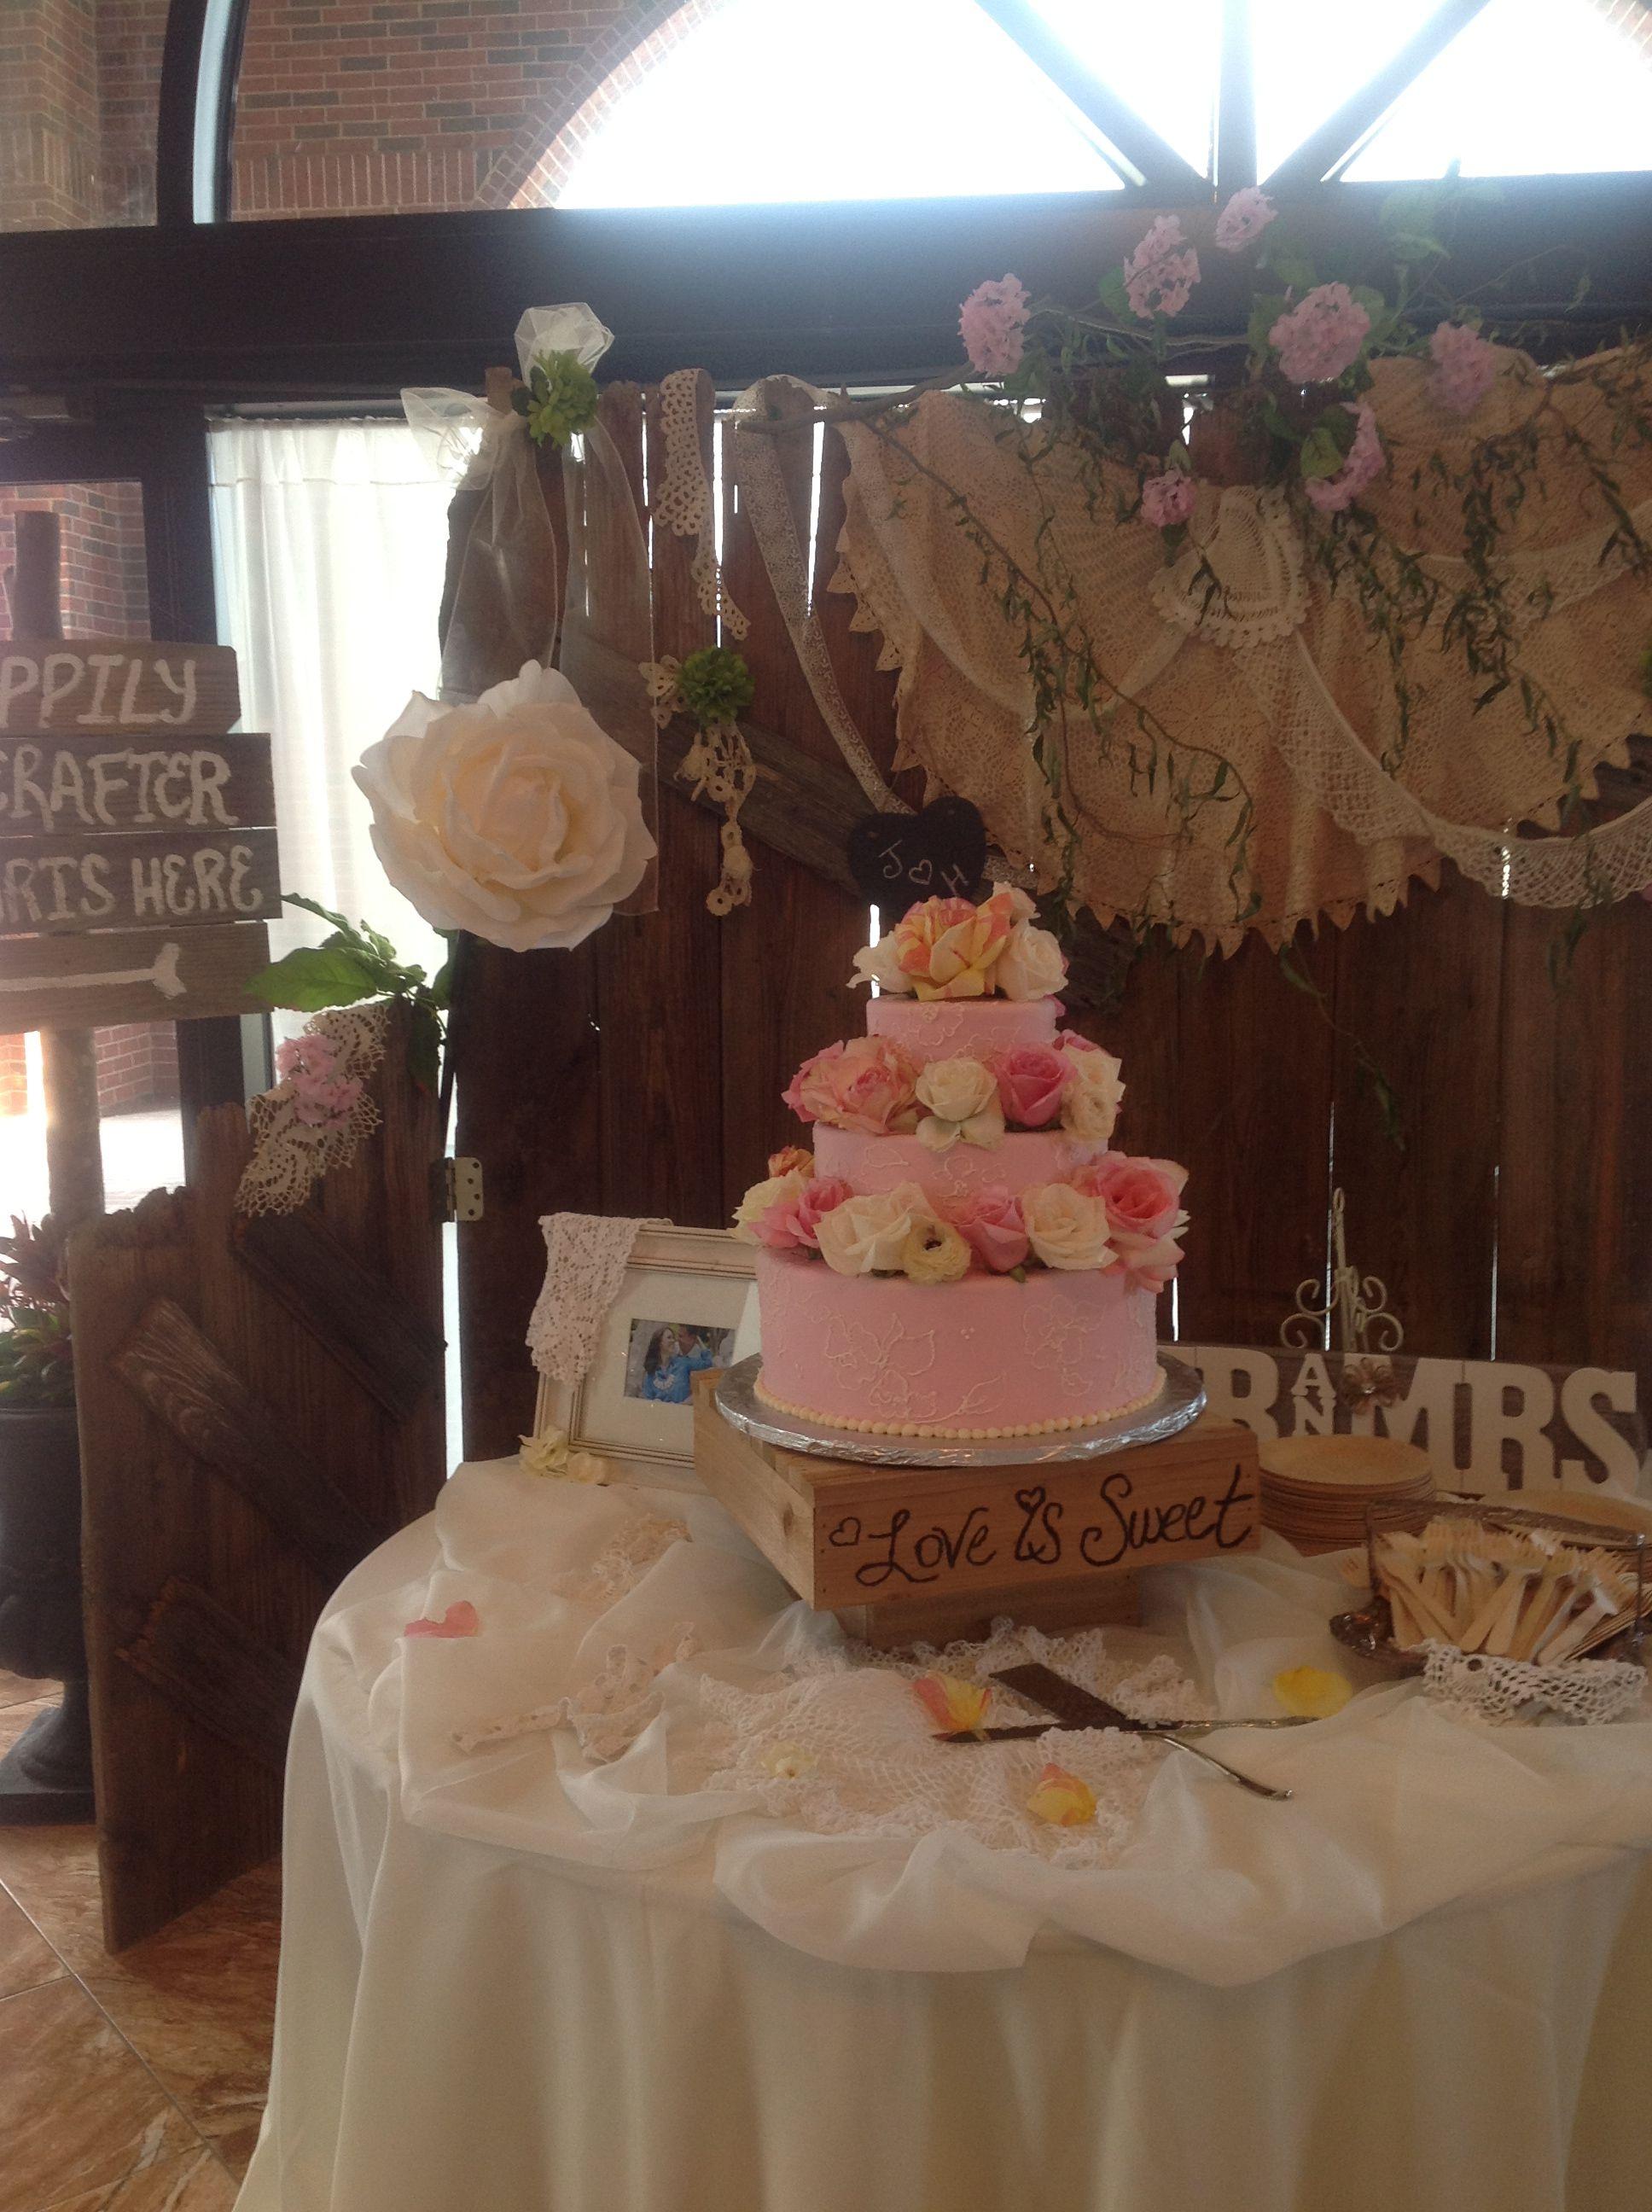 Beautiful Elegant Shabby Chic Rustic Cake Table Rustic Cake Tables Rustic Cake Cake Table